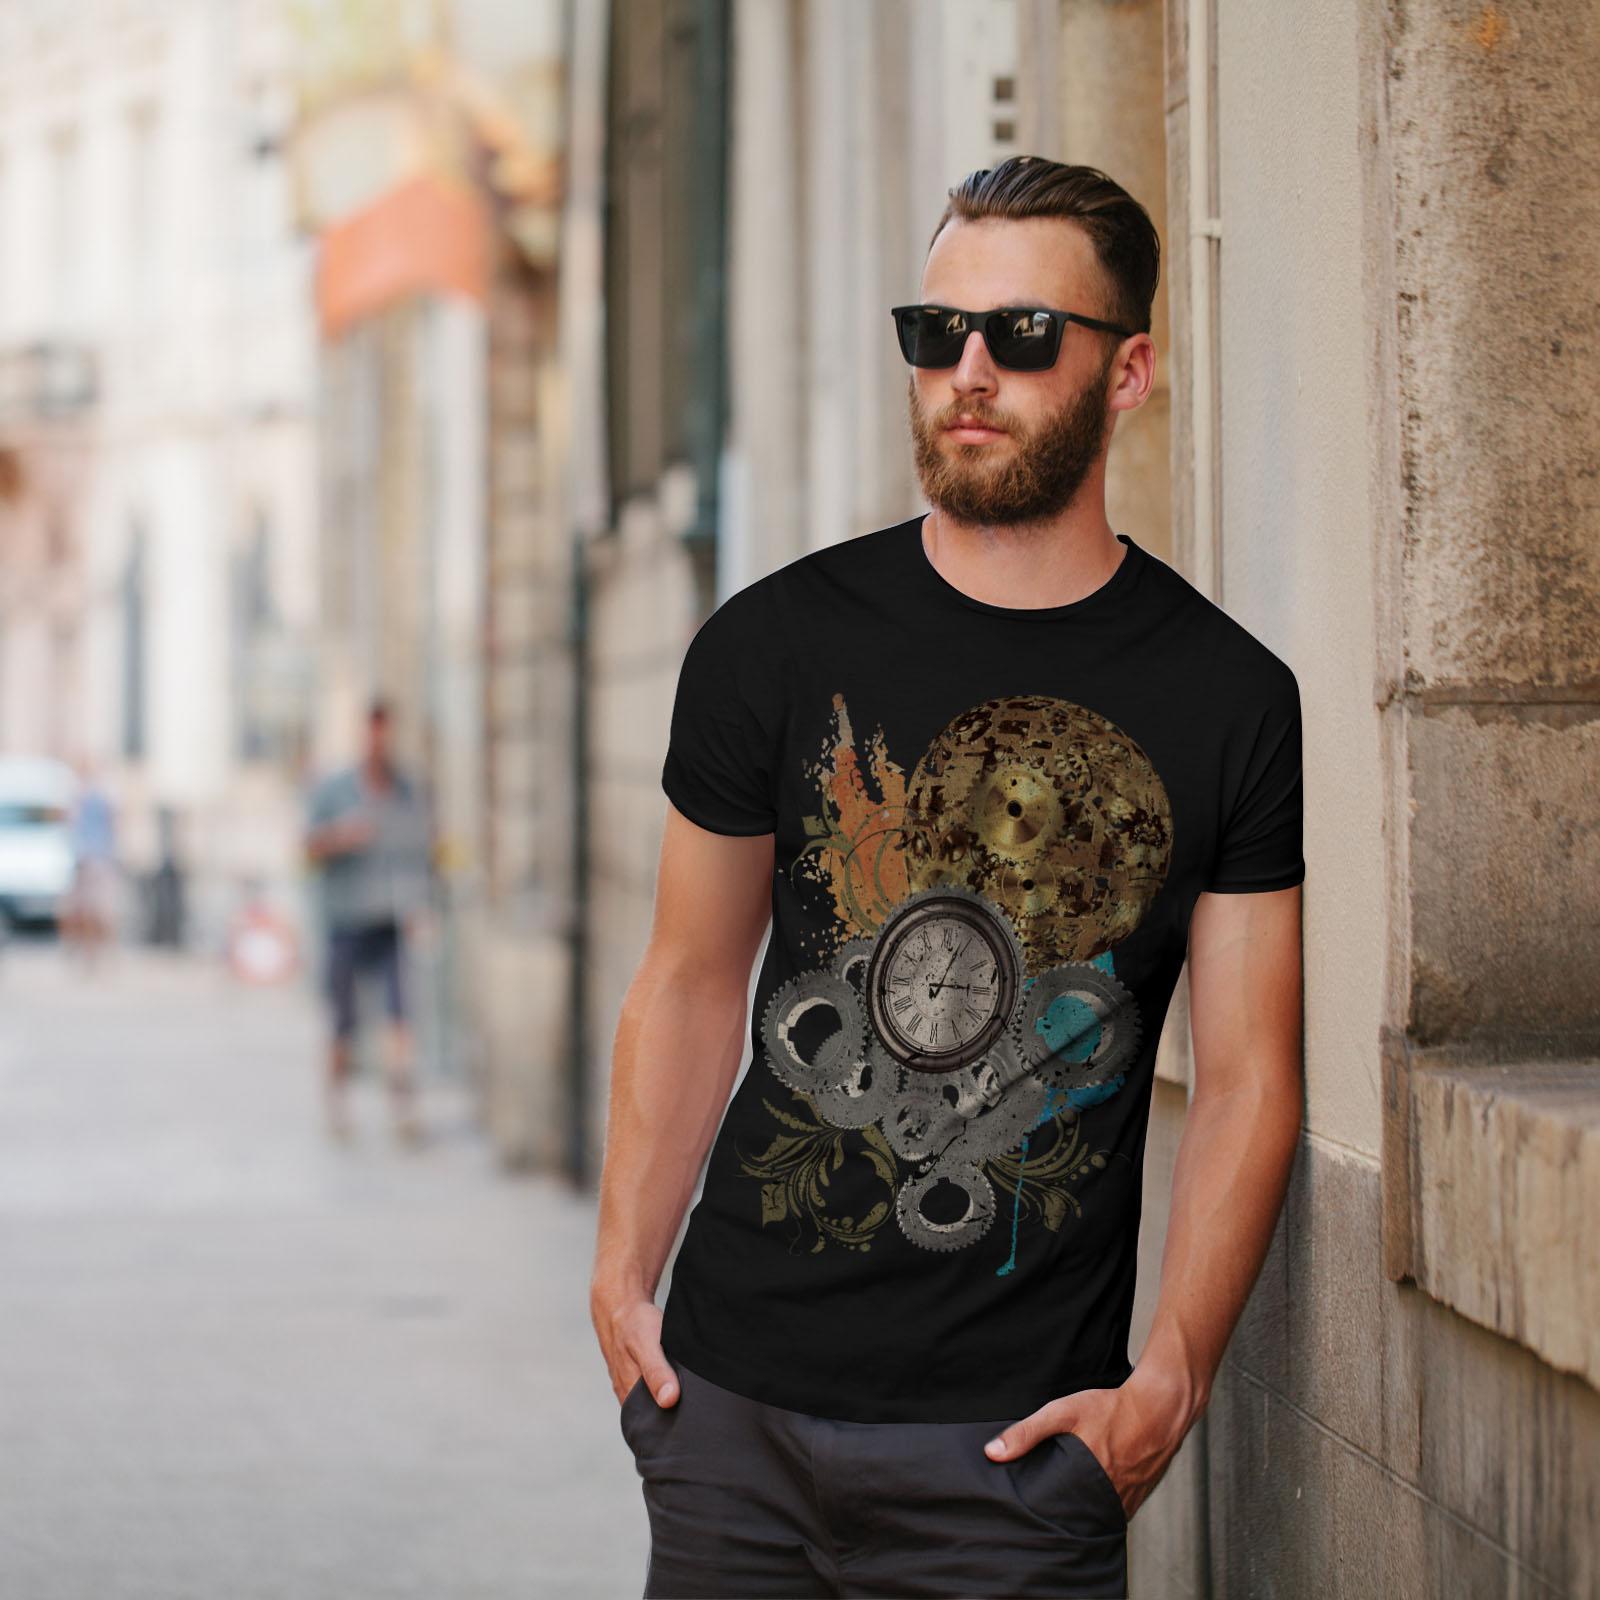 Wellcoda-Clock-Cool-Print-Mens-T-shirt-Illusion-Graphic-Design-Printed-Tee thumbnail 5